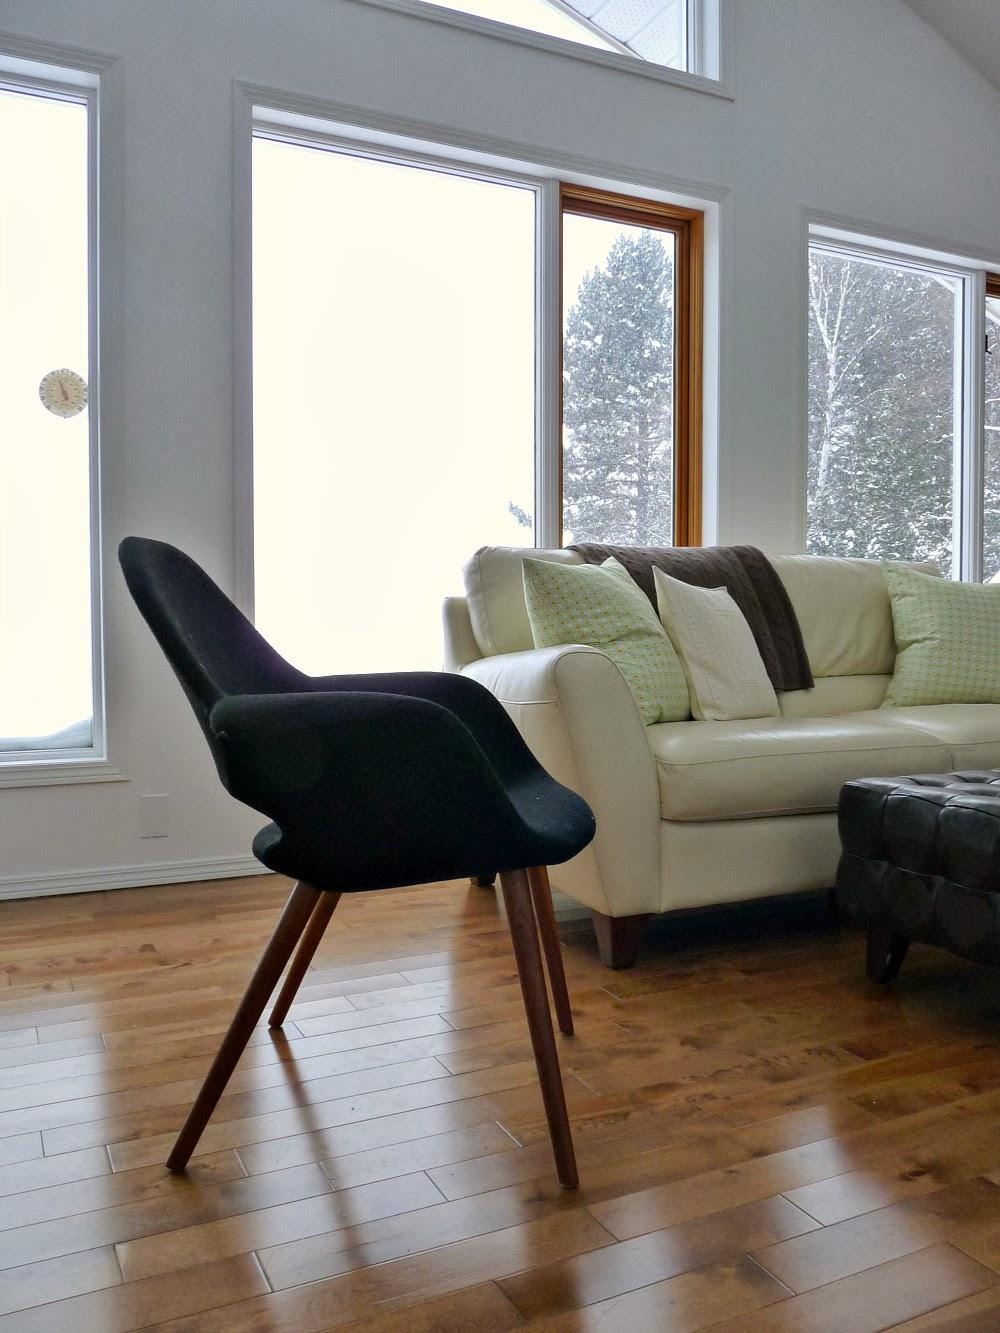 Black Wool Organic Chair from The Modern Shop, Ottawa